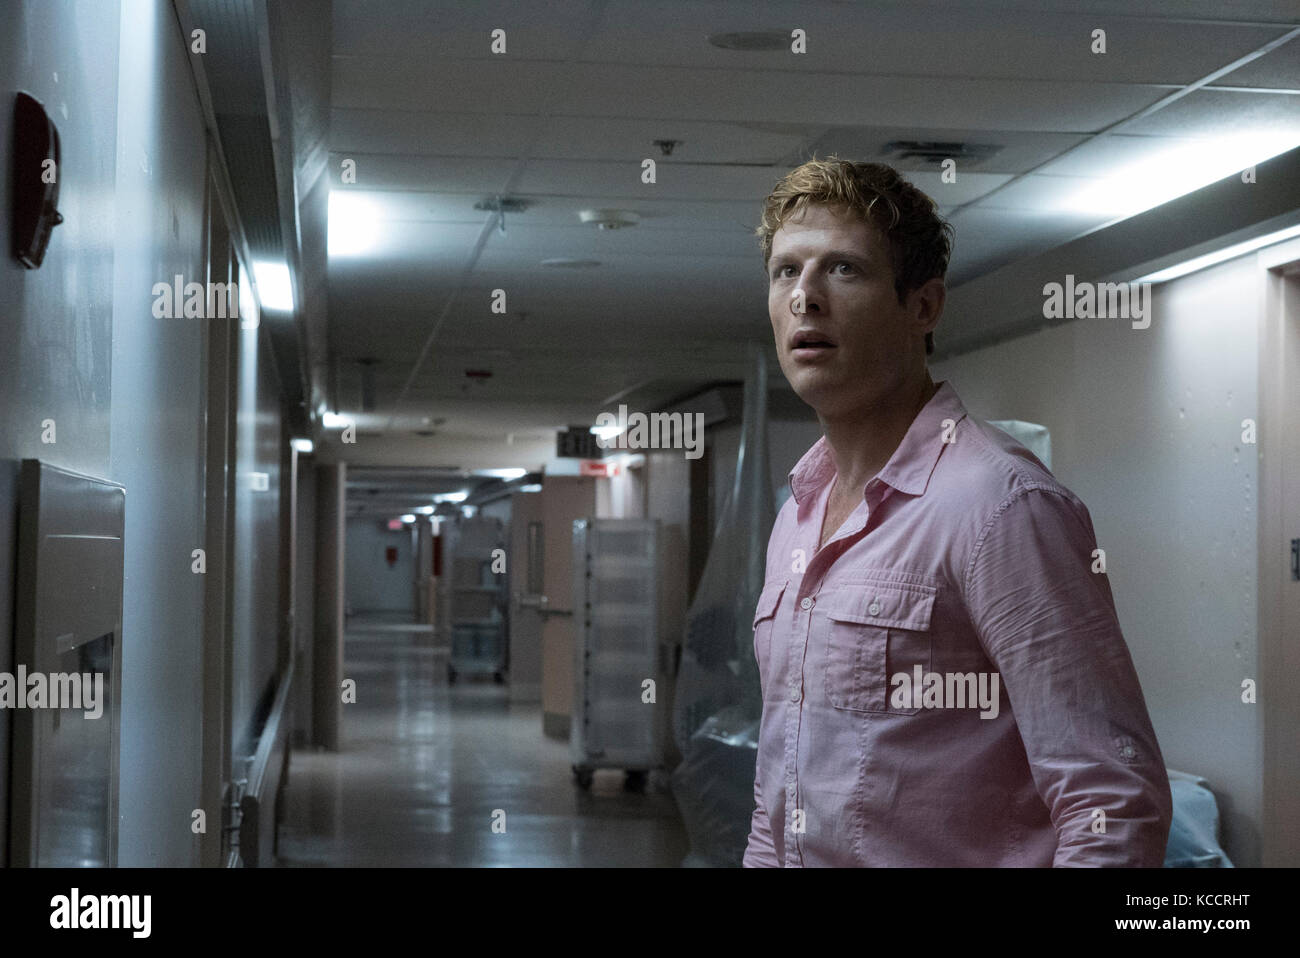 RELEASE DATE: TITLE: September 29, 2017. Flatliners. STUDIO: Columbia Pictures. DIRECTOR: Niels Arden Oplev. PLOT: - Stock Image